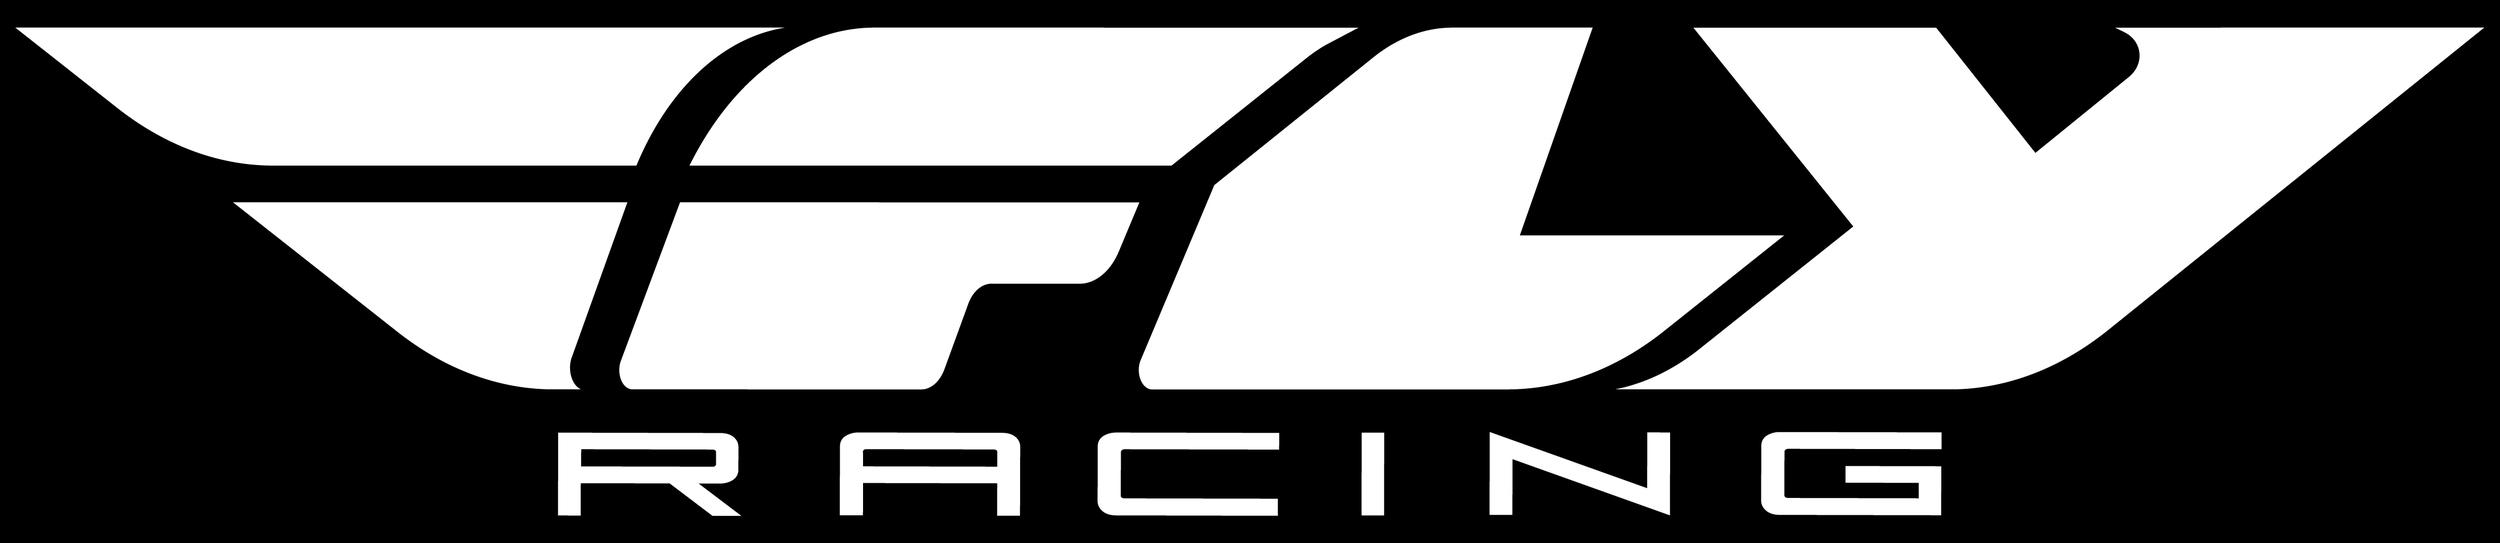 Fly_racing_logo_black